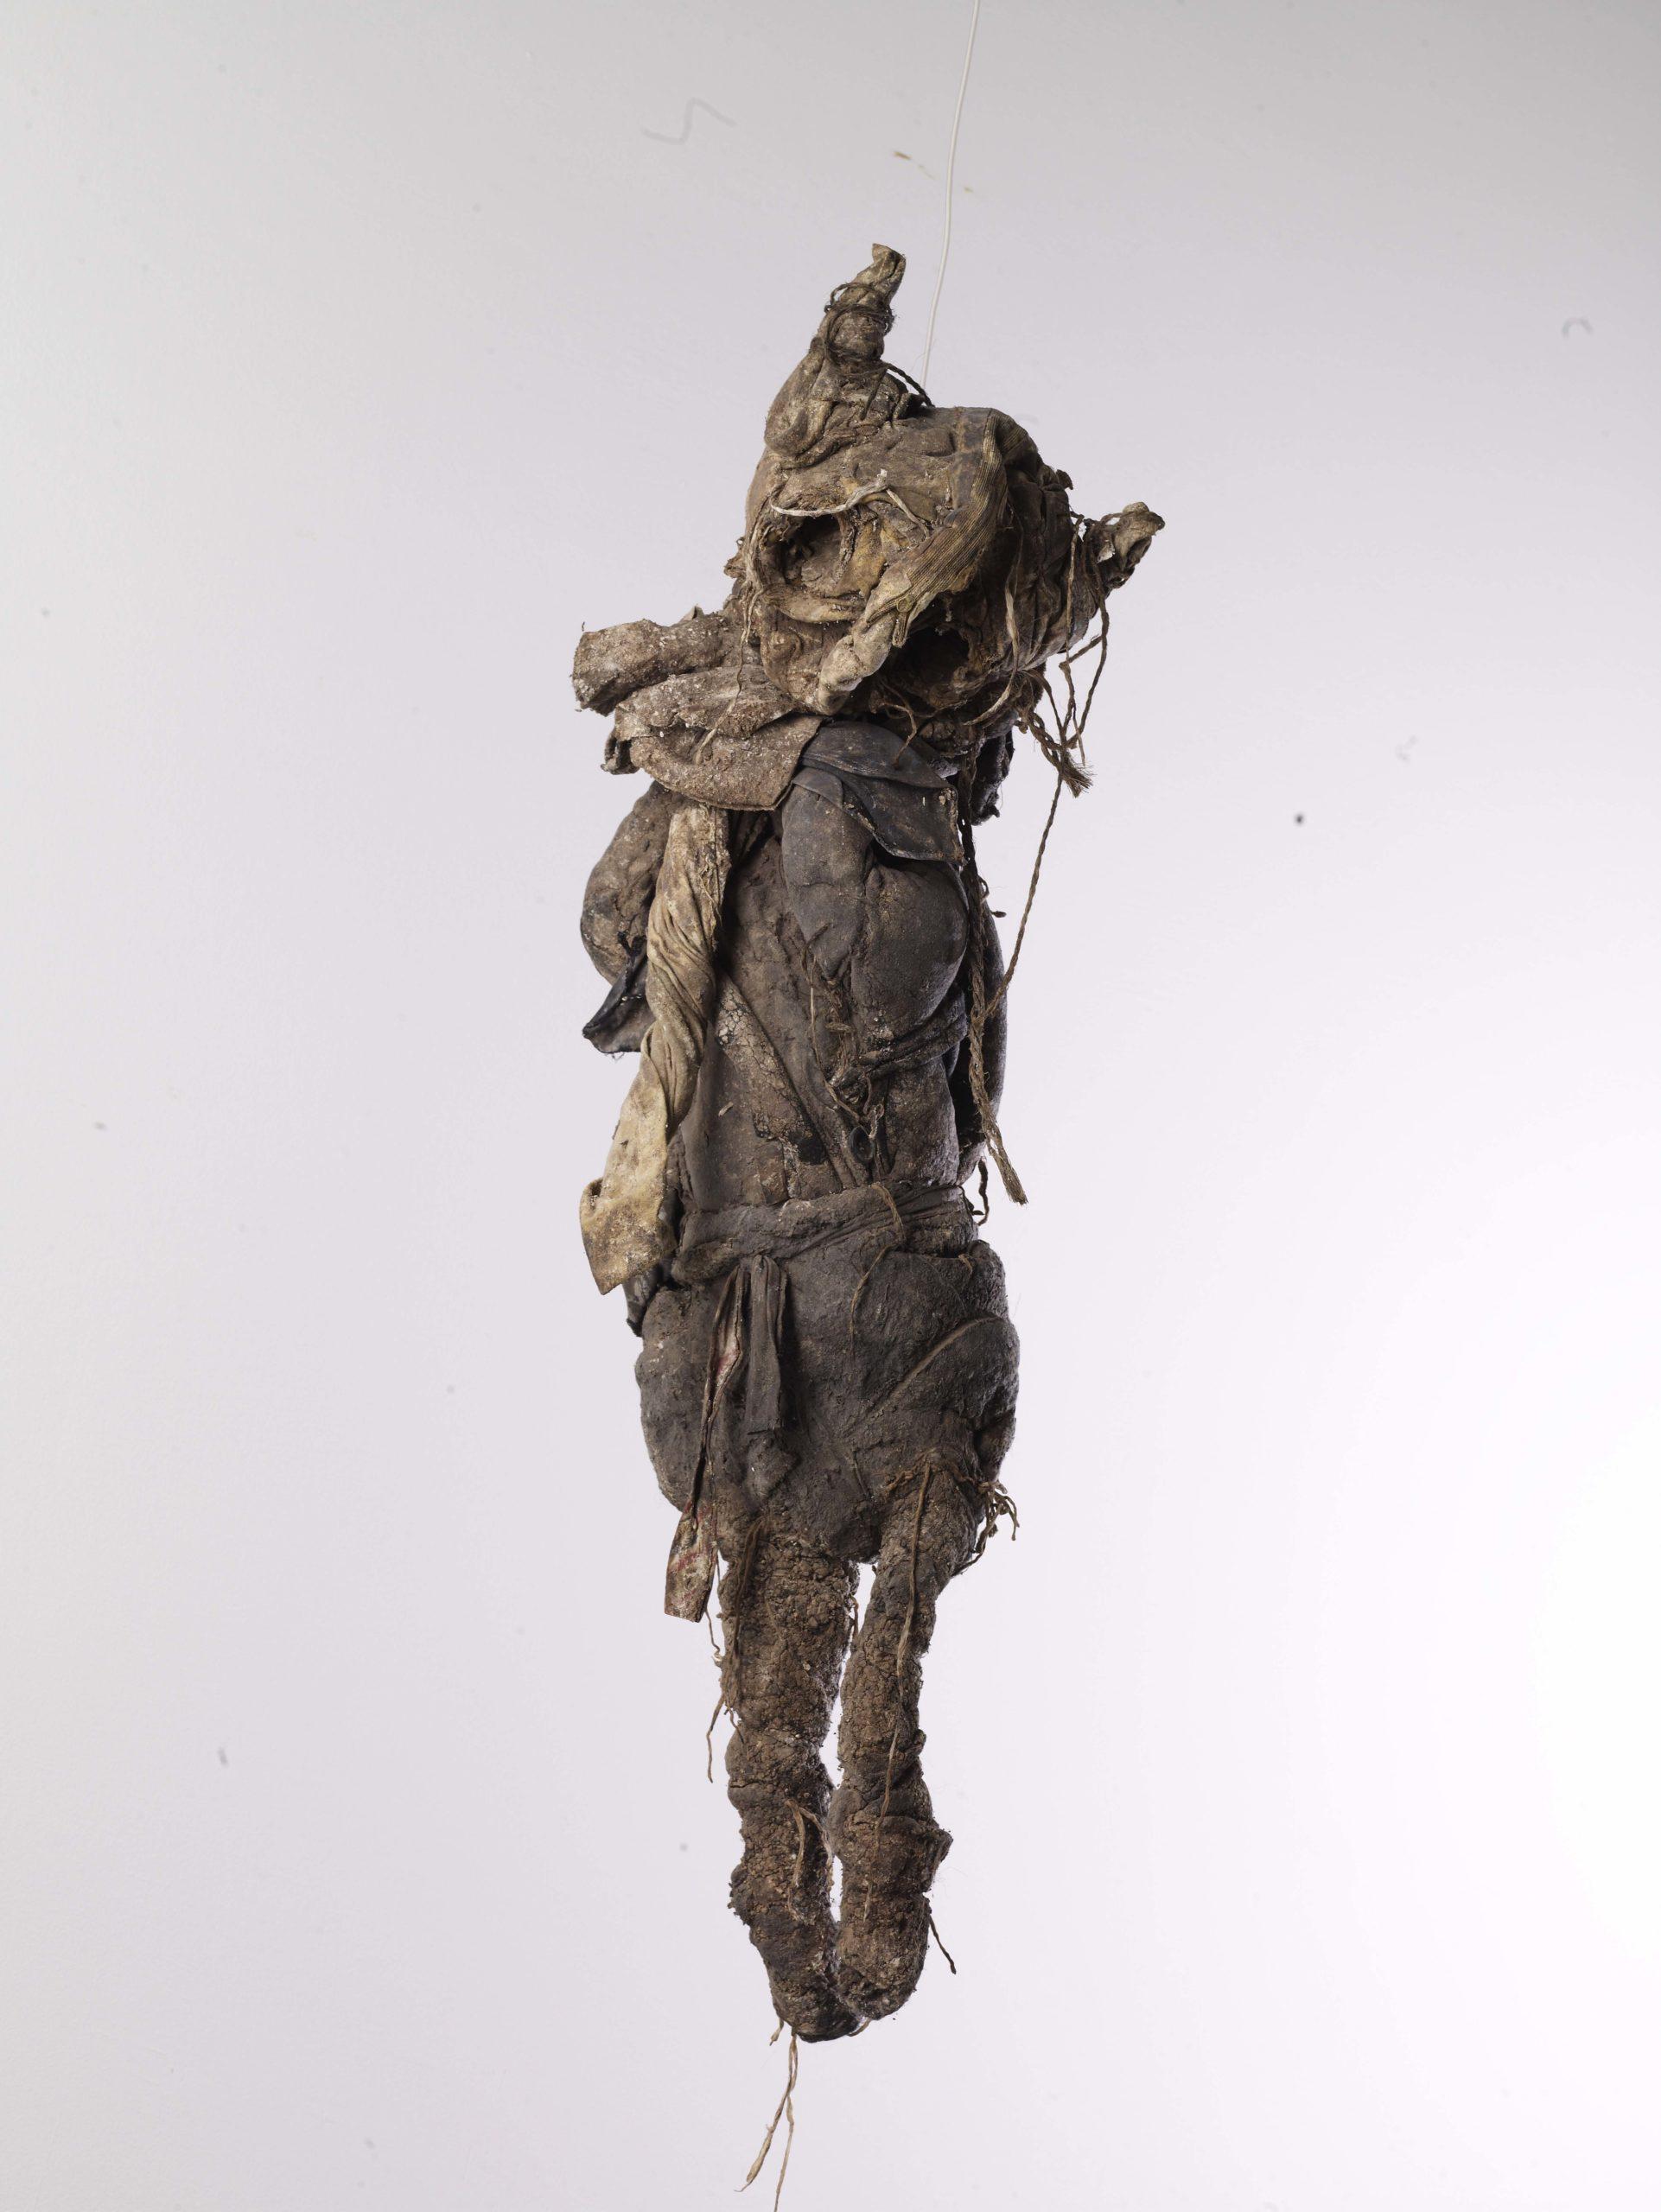 nedjar michel - Poupée | untitled | Paris Darius 1996